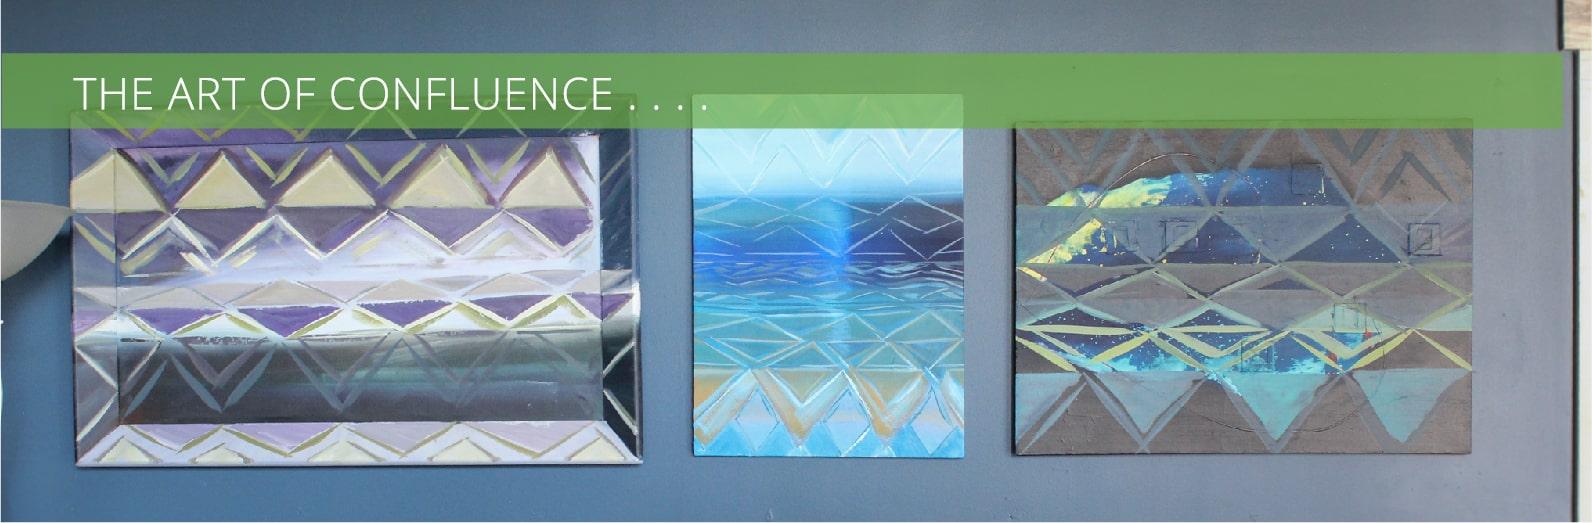 ART OF CONFLUENCE BANNER2-min.jpg